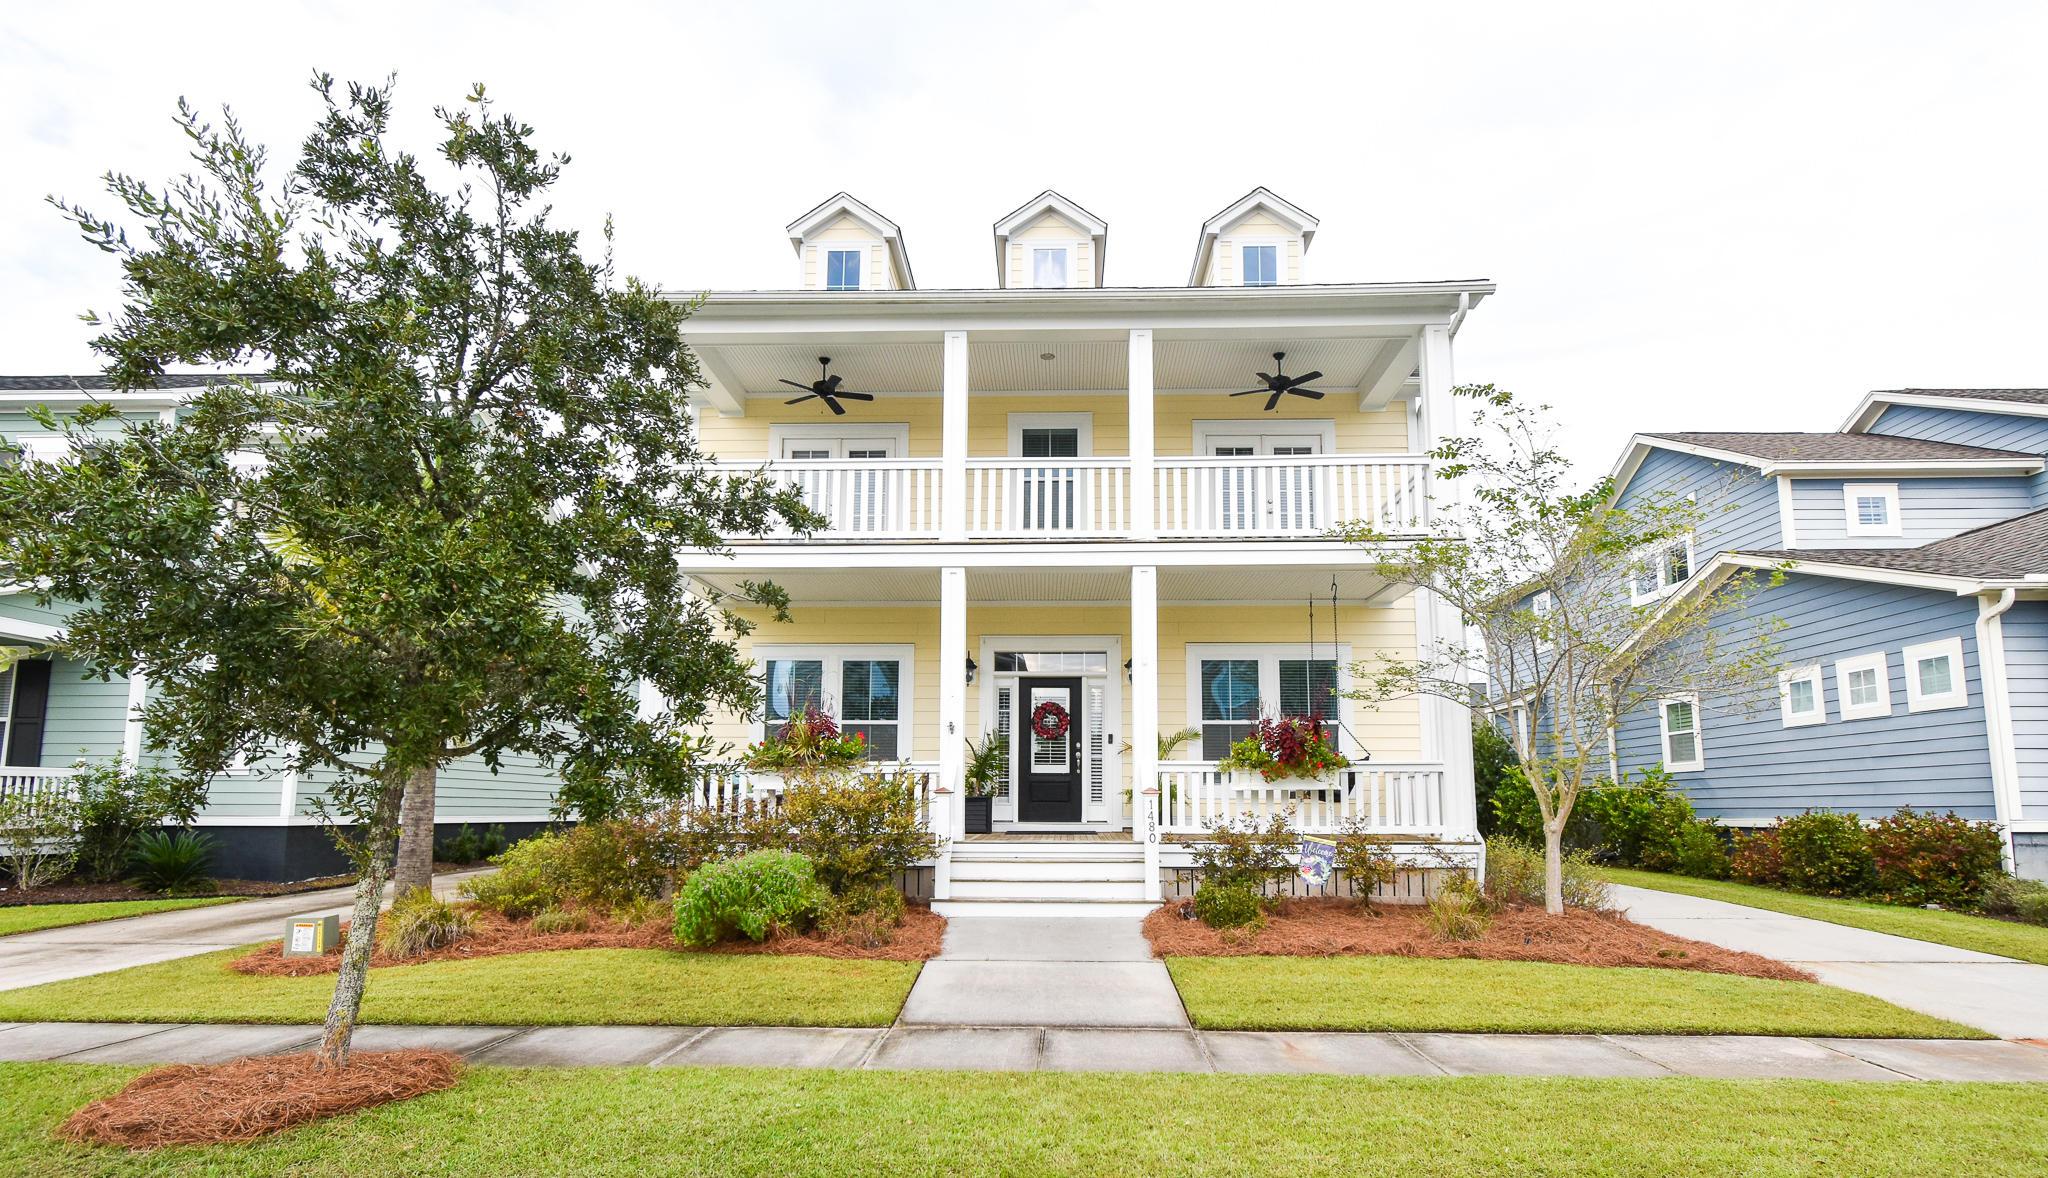 Carolina Park Homes For Sale - 1480 Croaton, Mount Pleasant, SC - 2